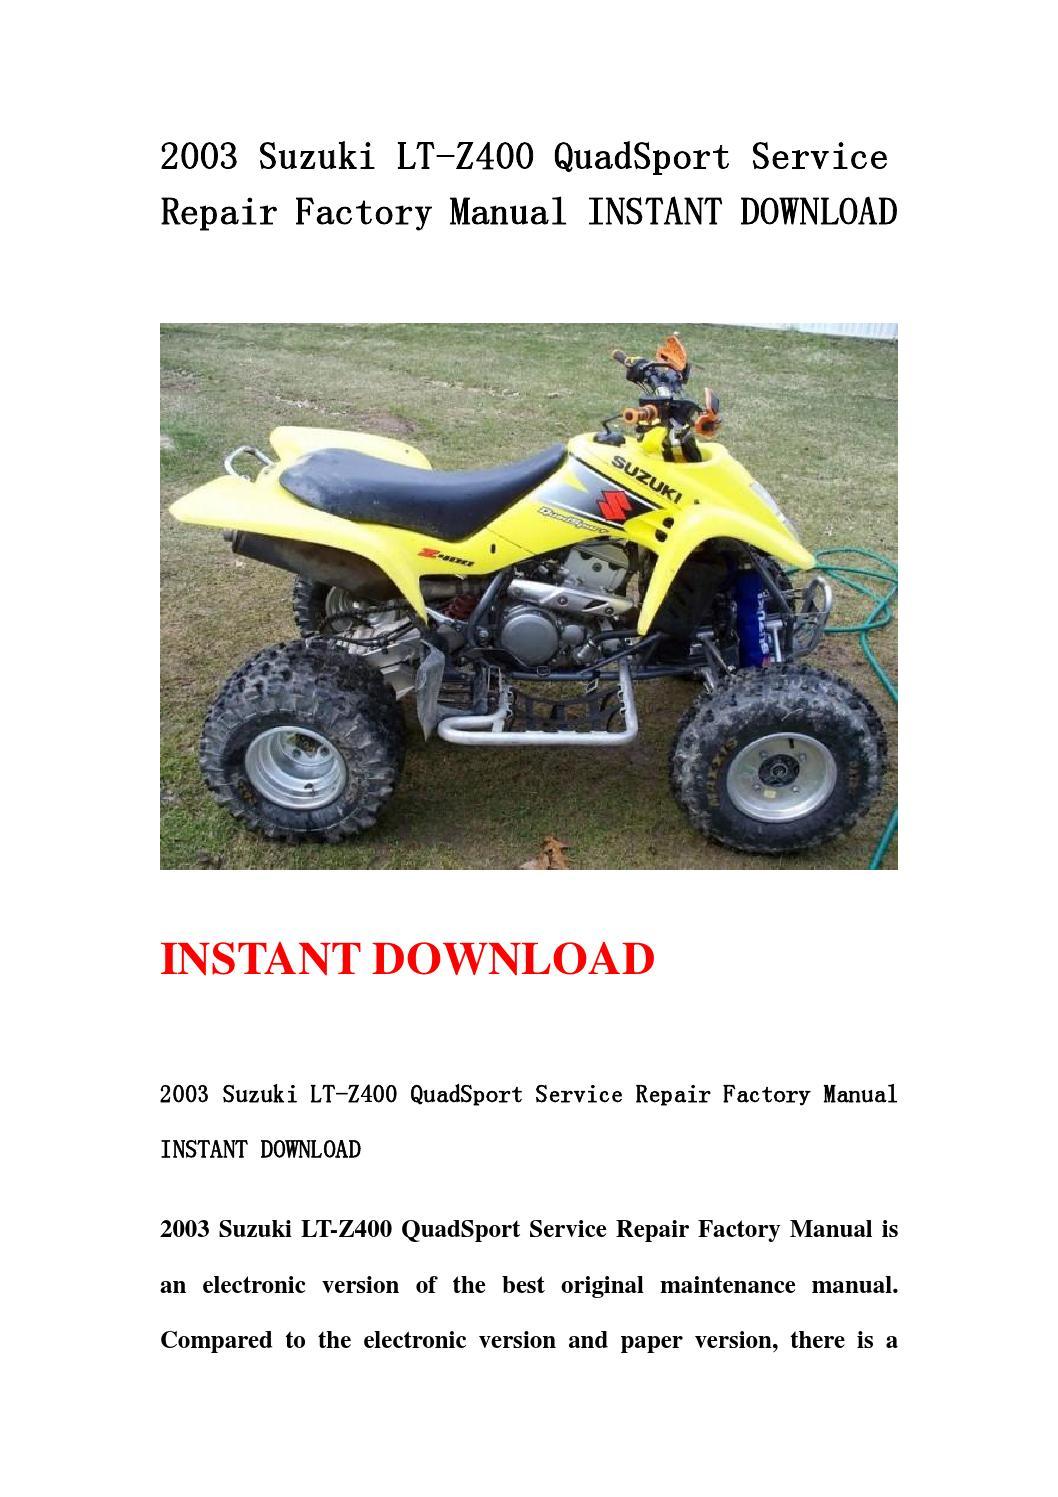 Suzuki 230 quadsport manual download